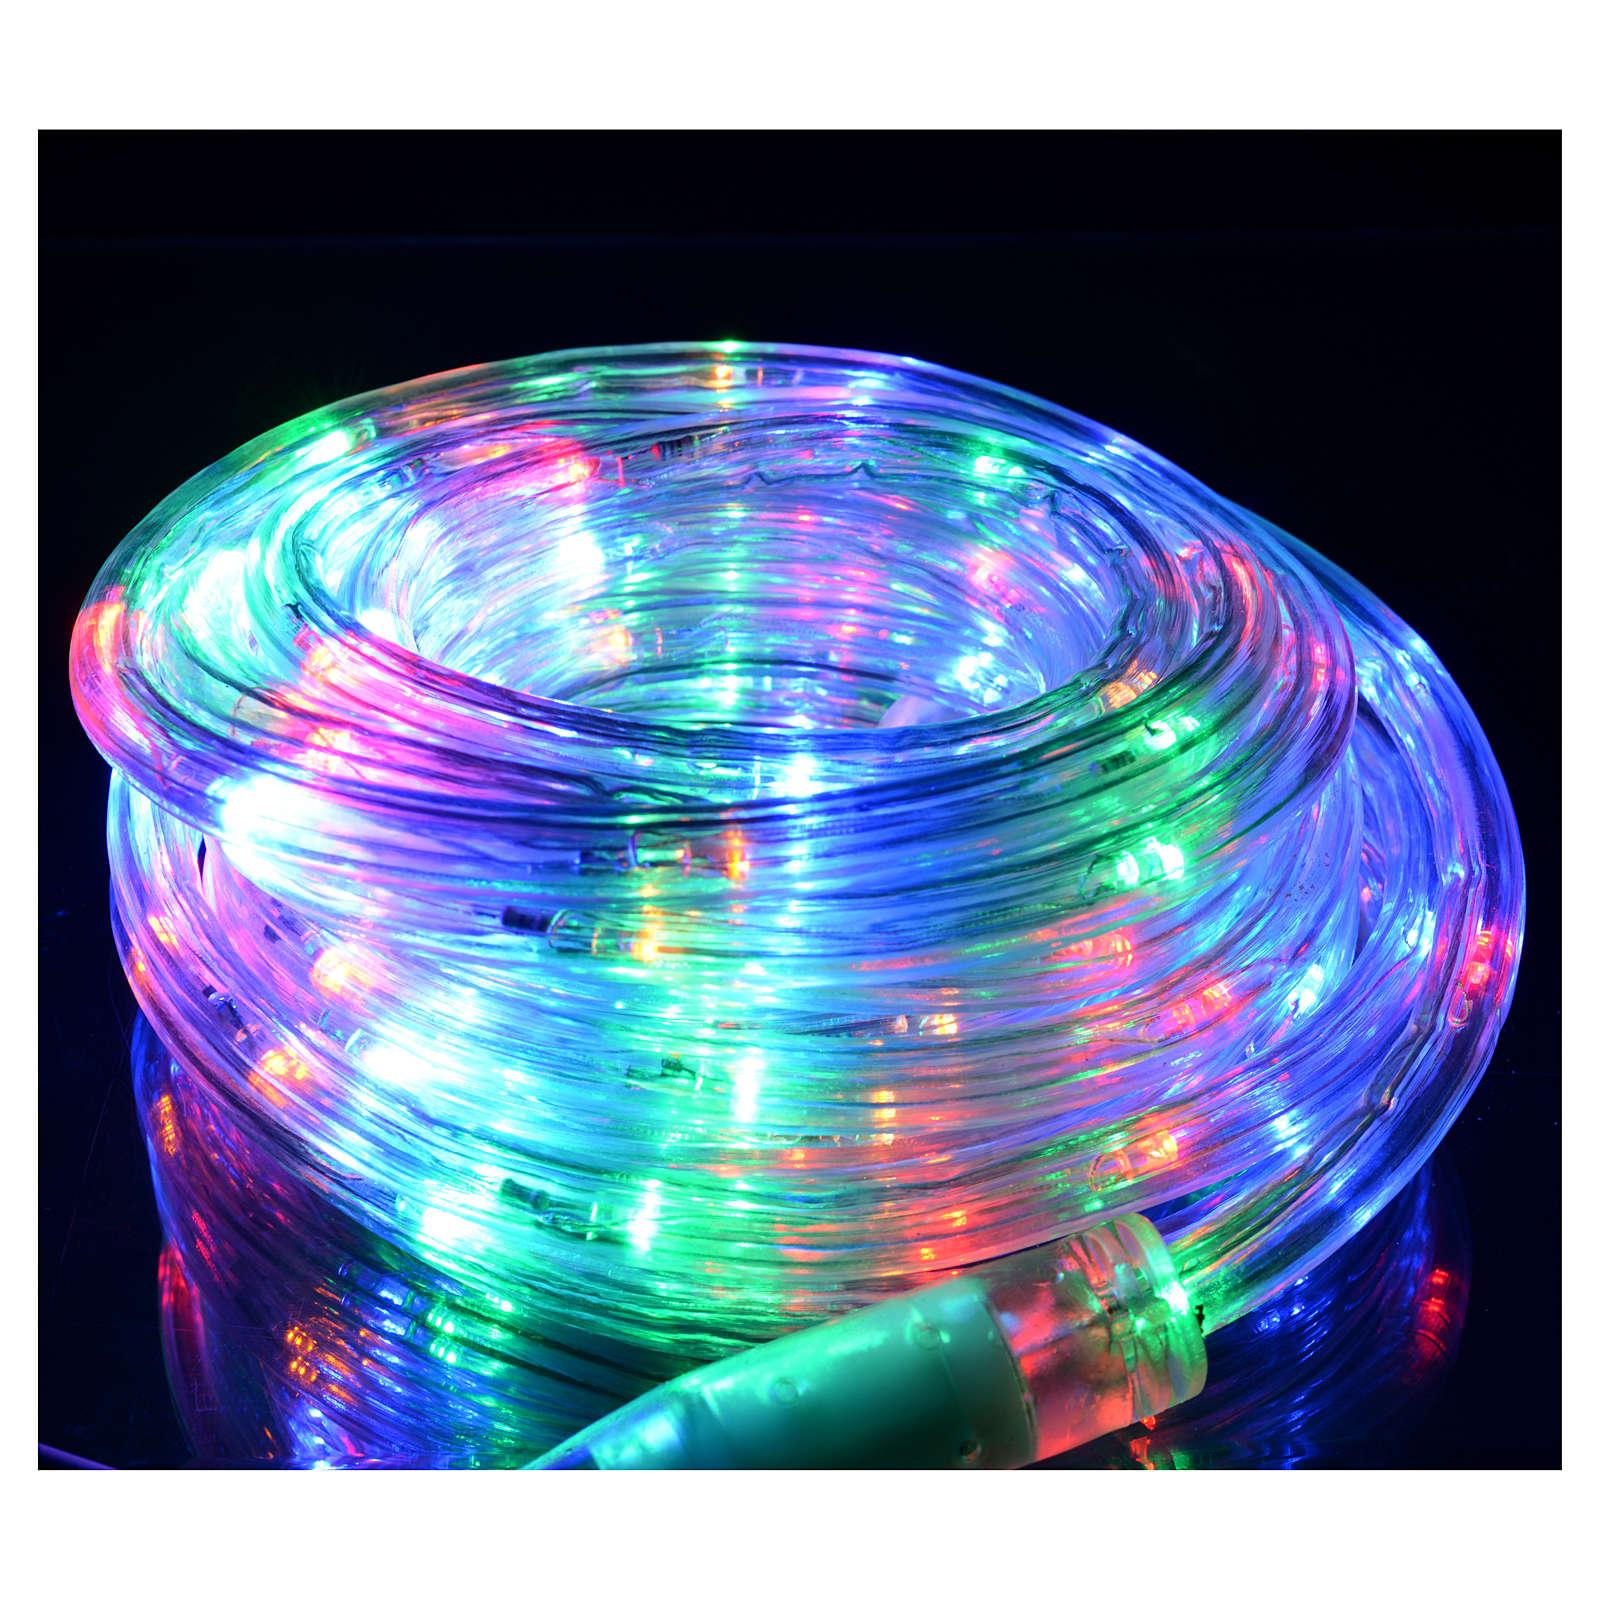 Luminaire de Noël tube led 6m programmable int/ext 3